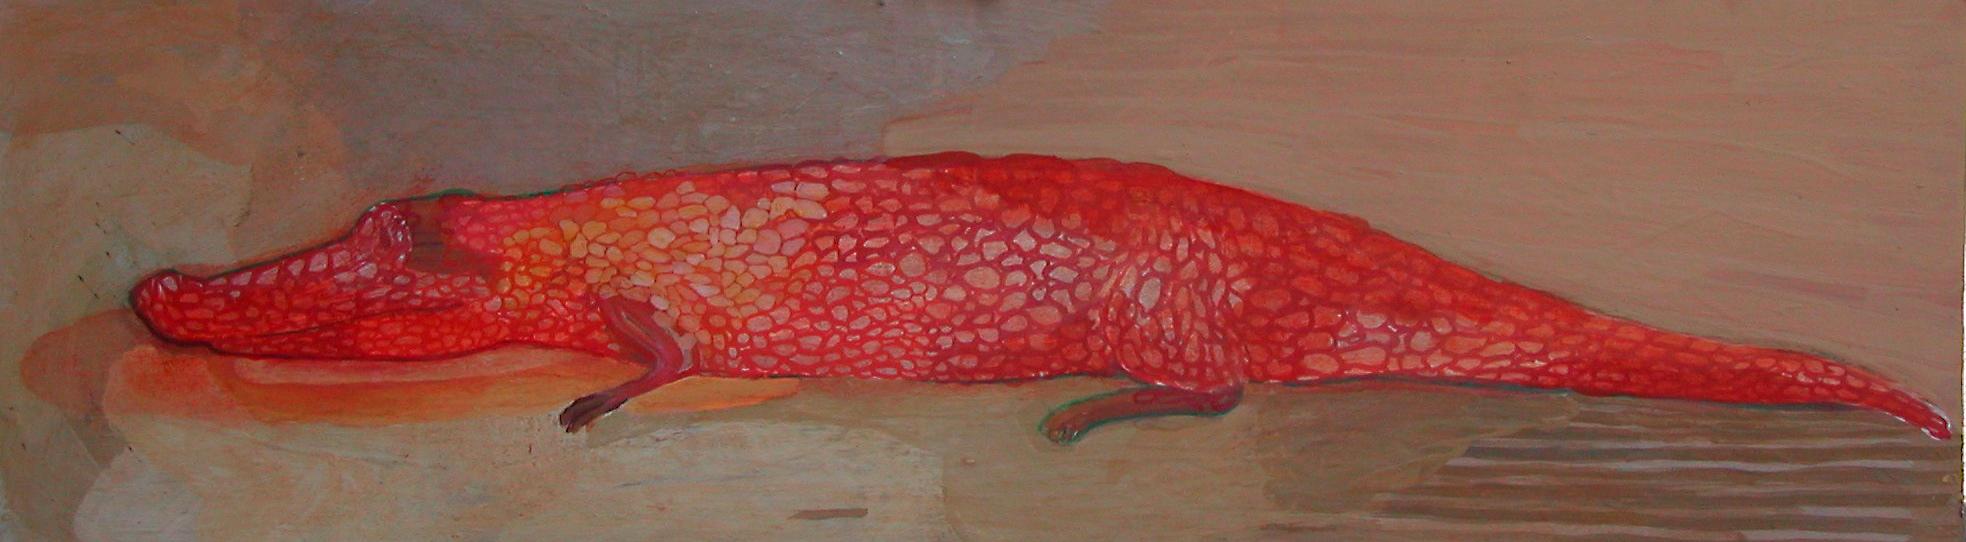 Eva Dahlin, Röd krokodil